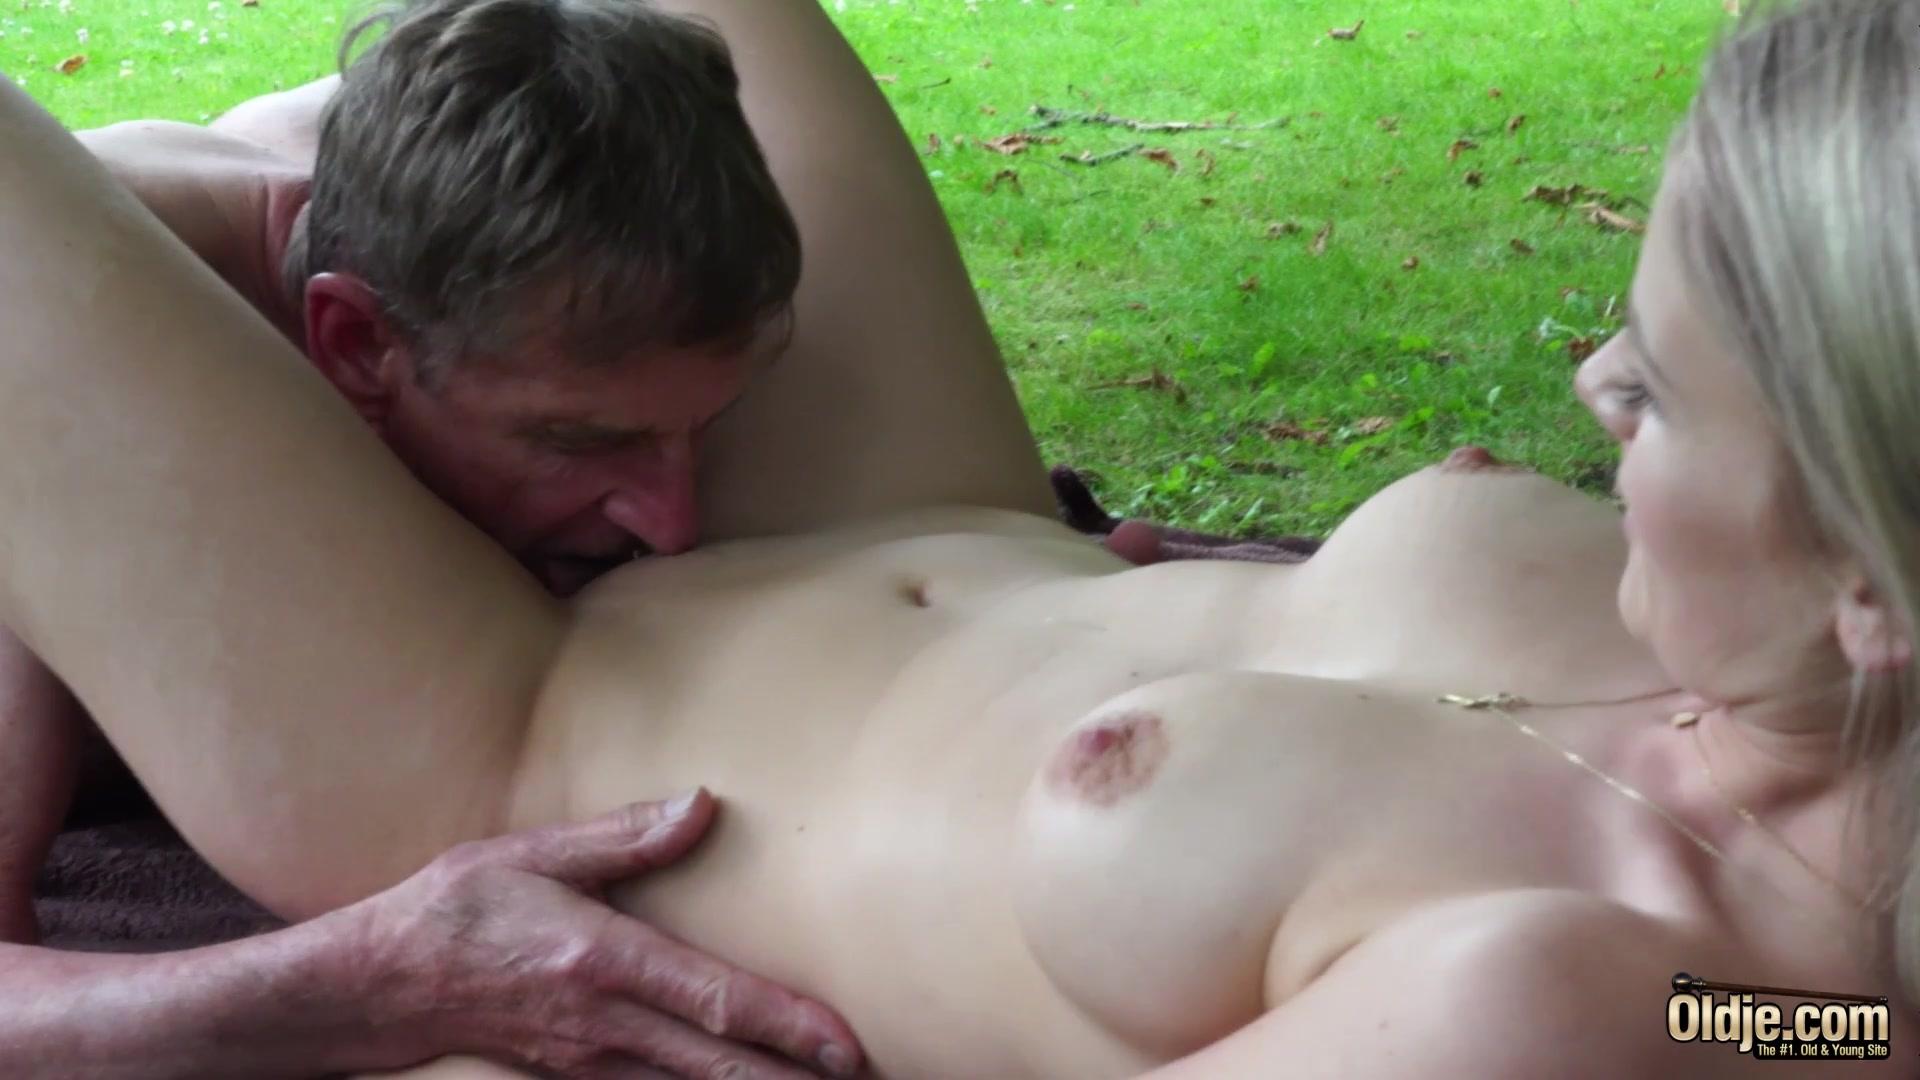 Старик С Молодой На Природе Порно